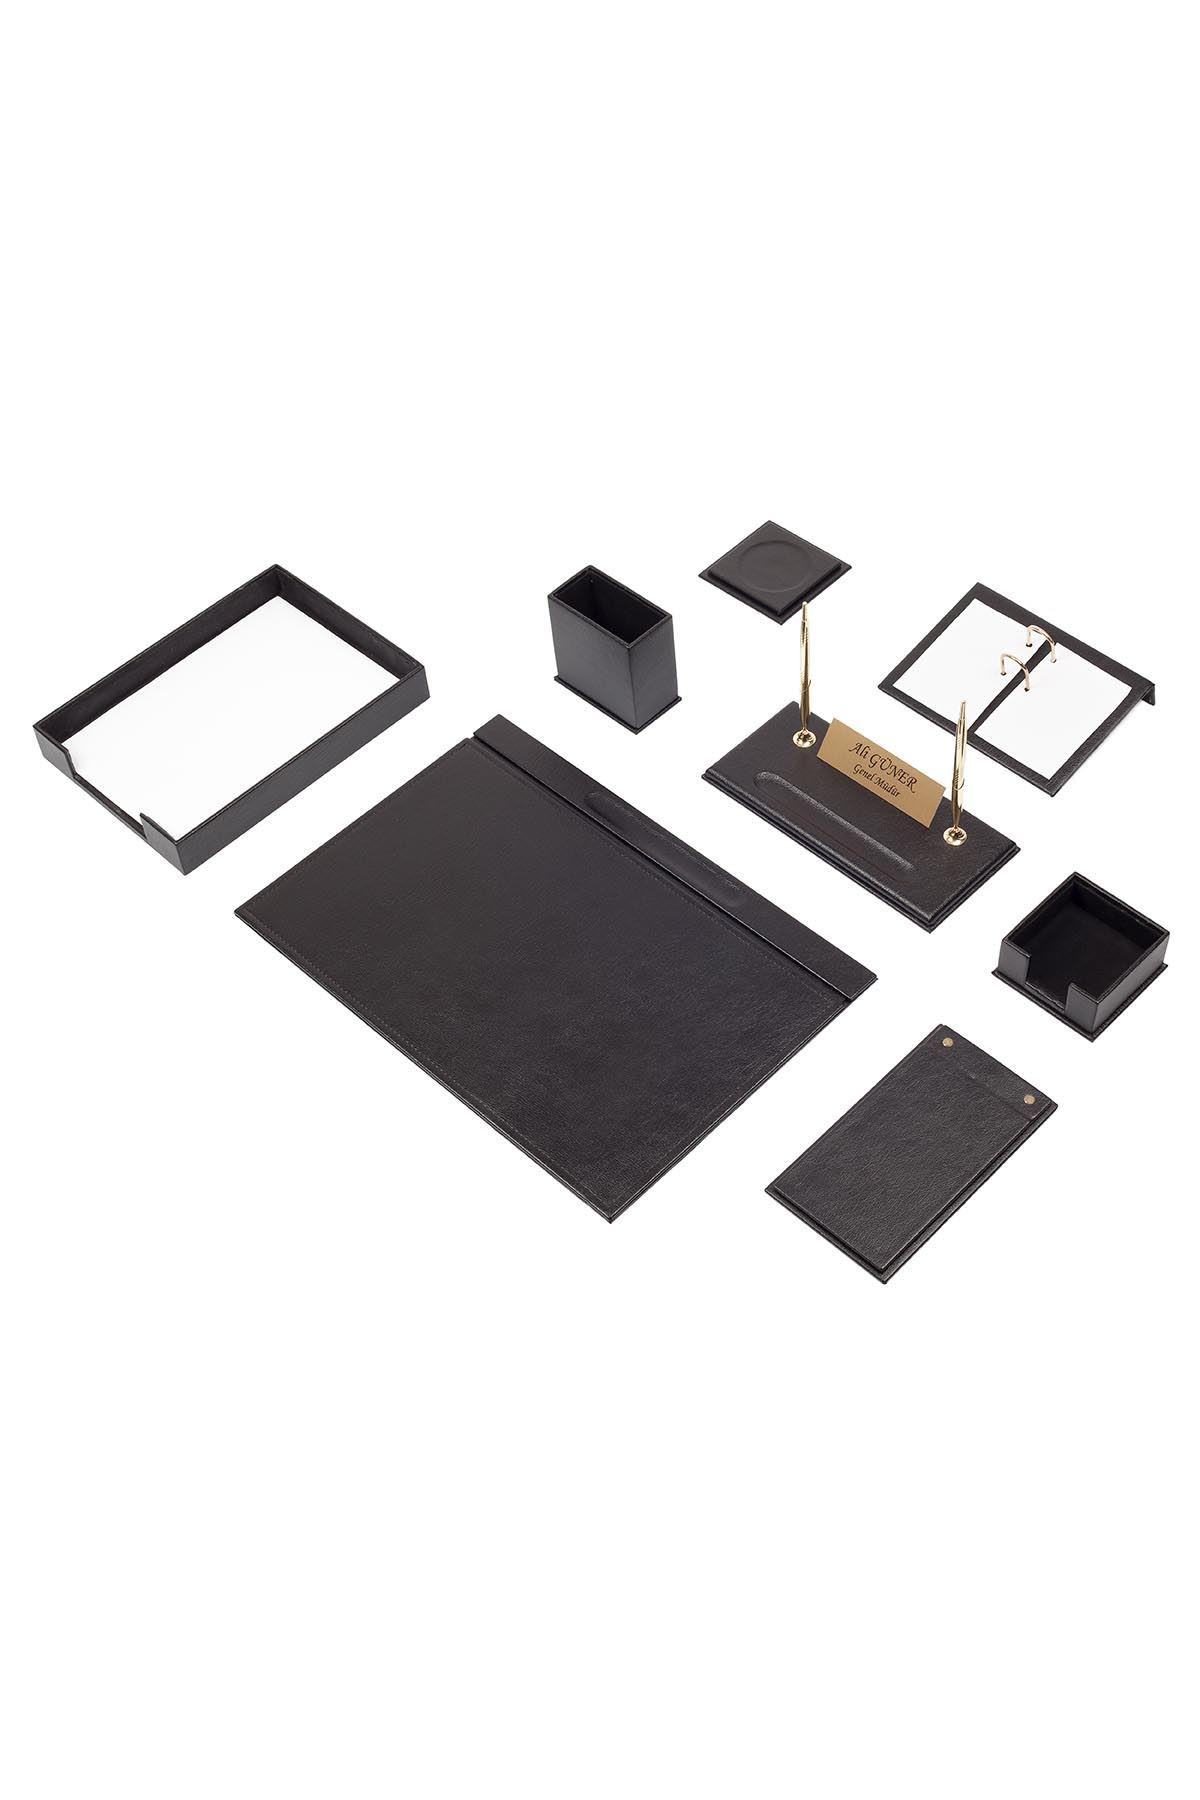 Leather Desk Organizer 10 Accessories Black